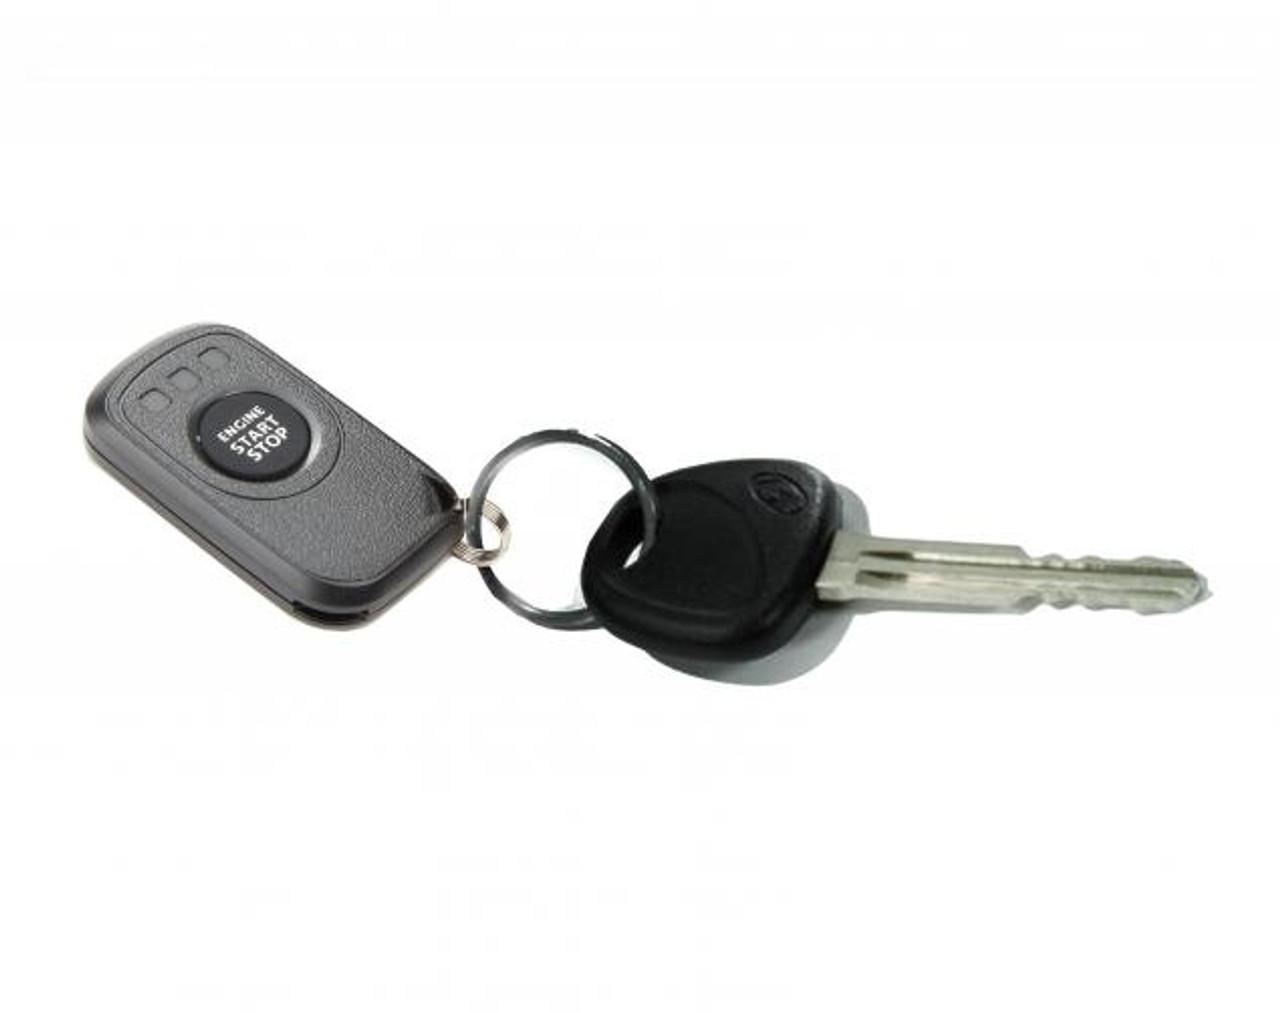 2018 2020 Hyundai Kona Remote Car Starter Free Shipping Hyundai Shop